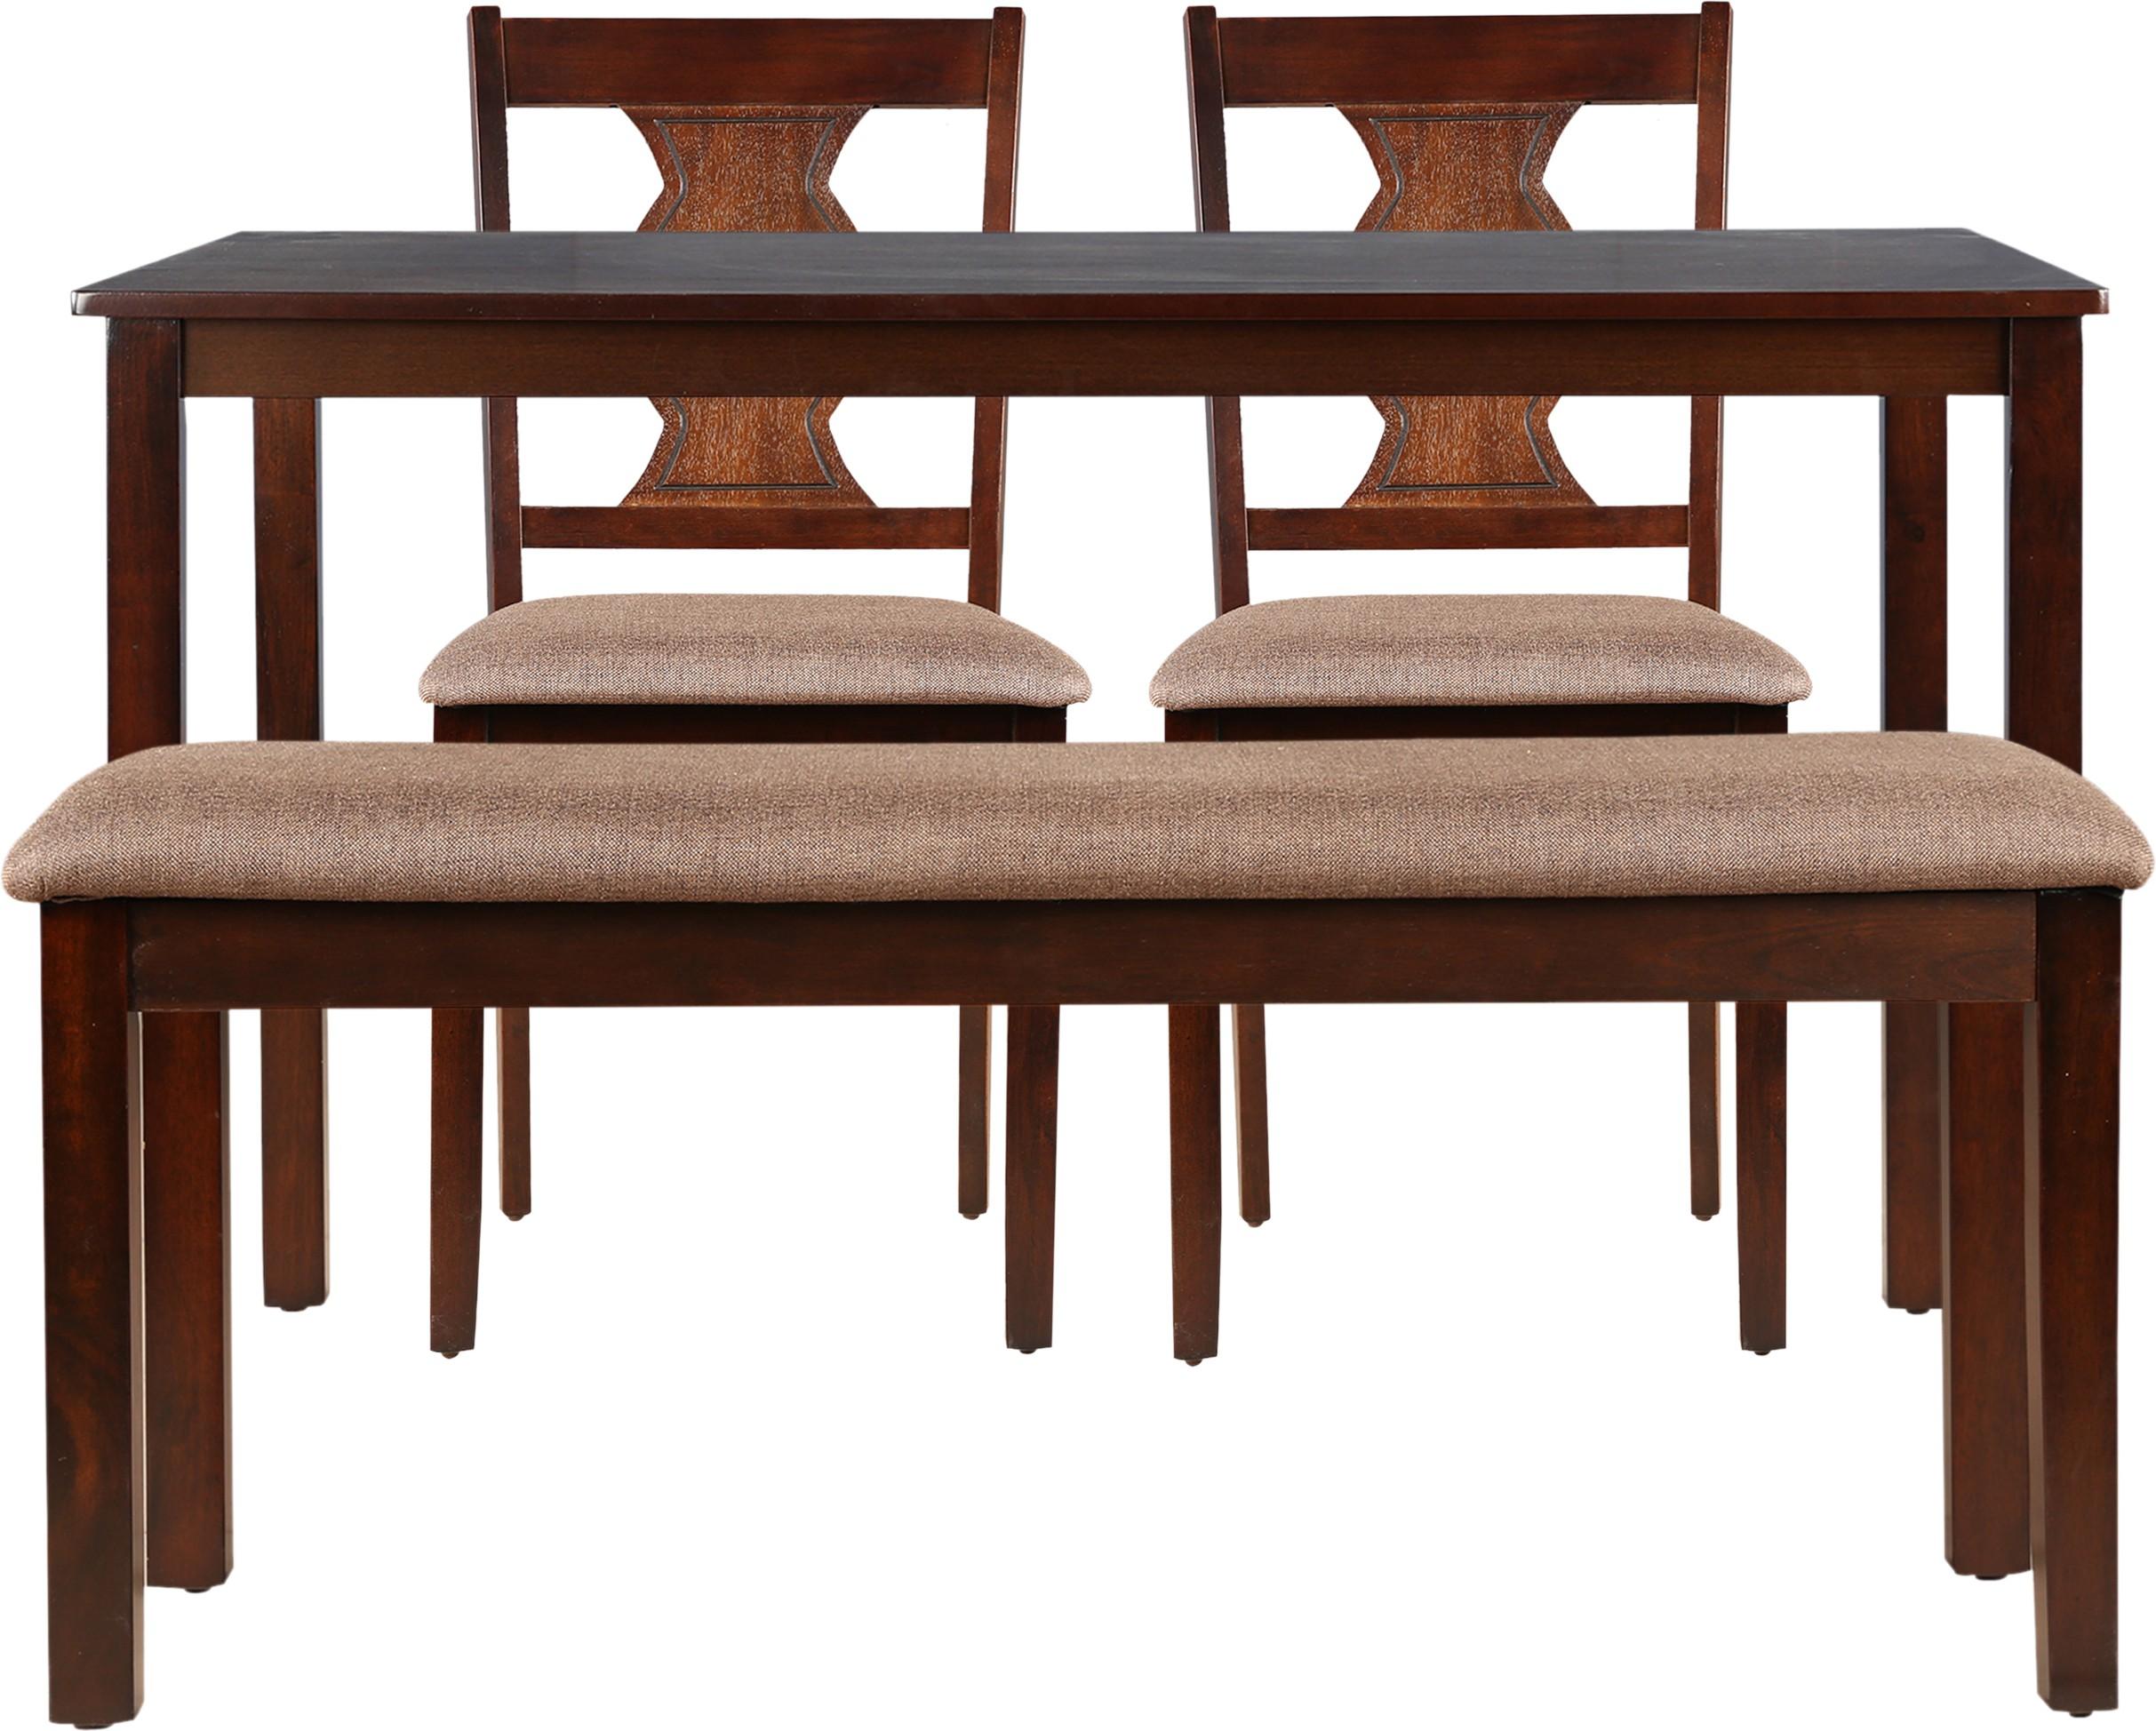 Hometown furniture price list hometown artois engineered wood